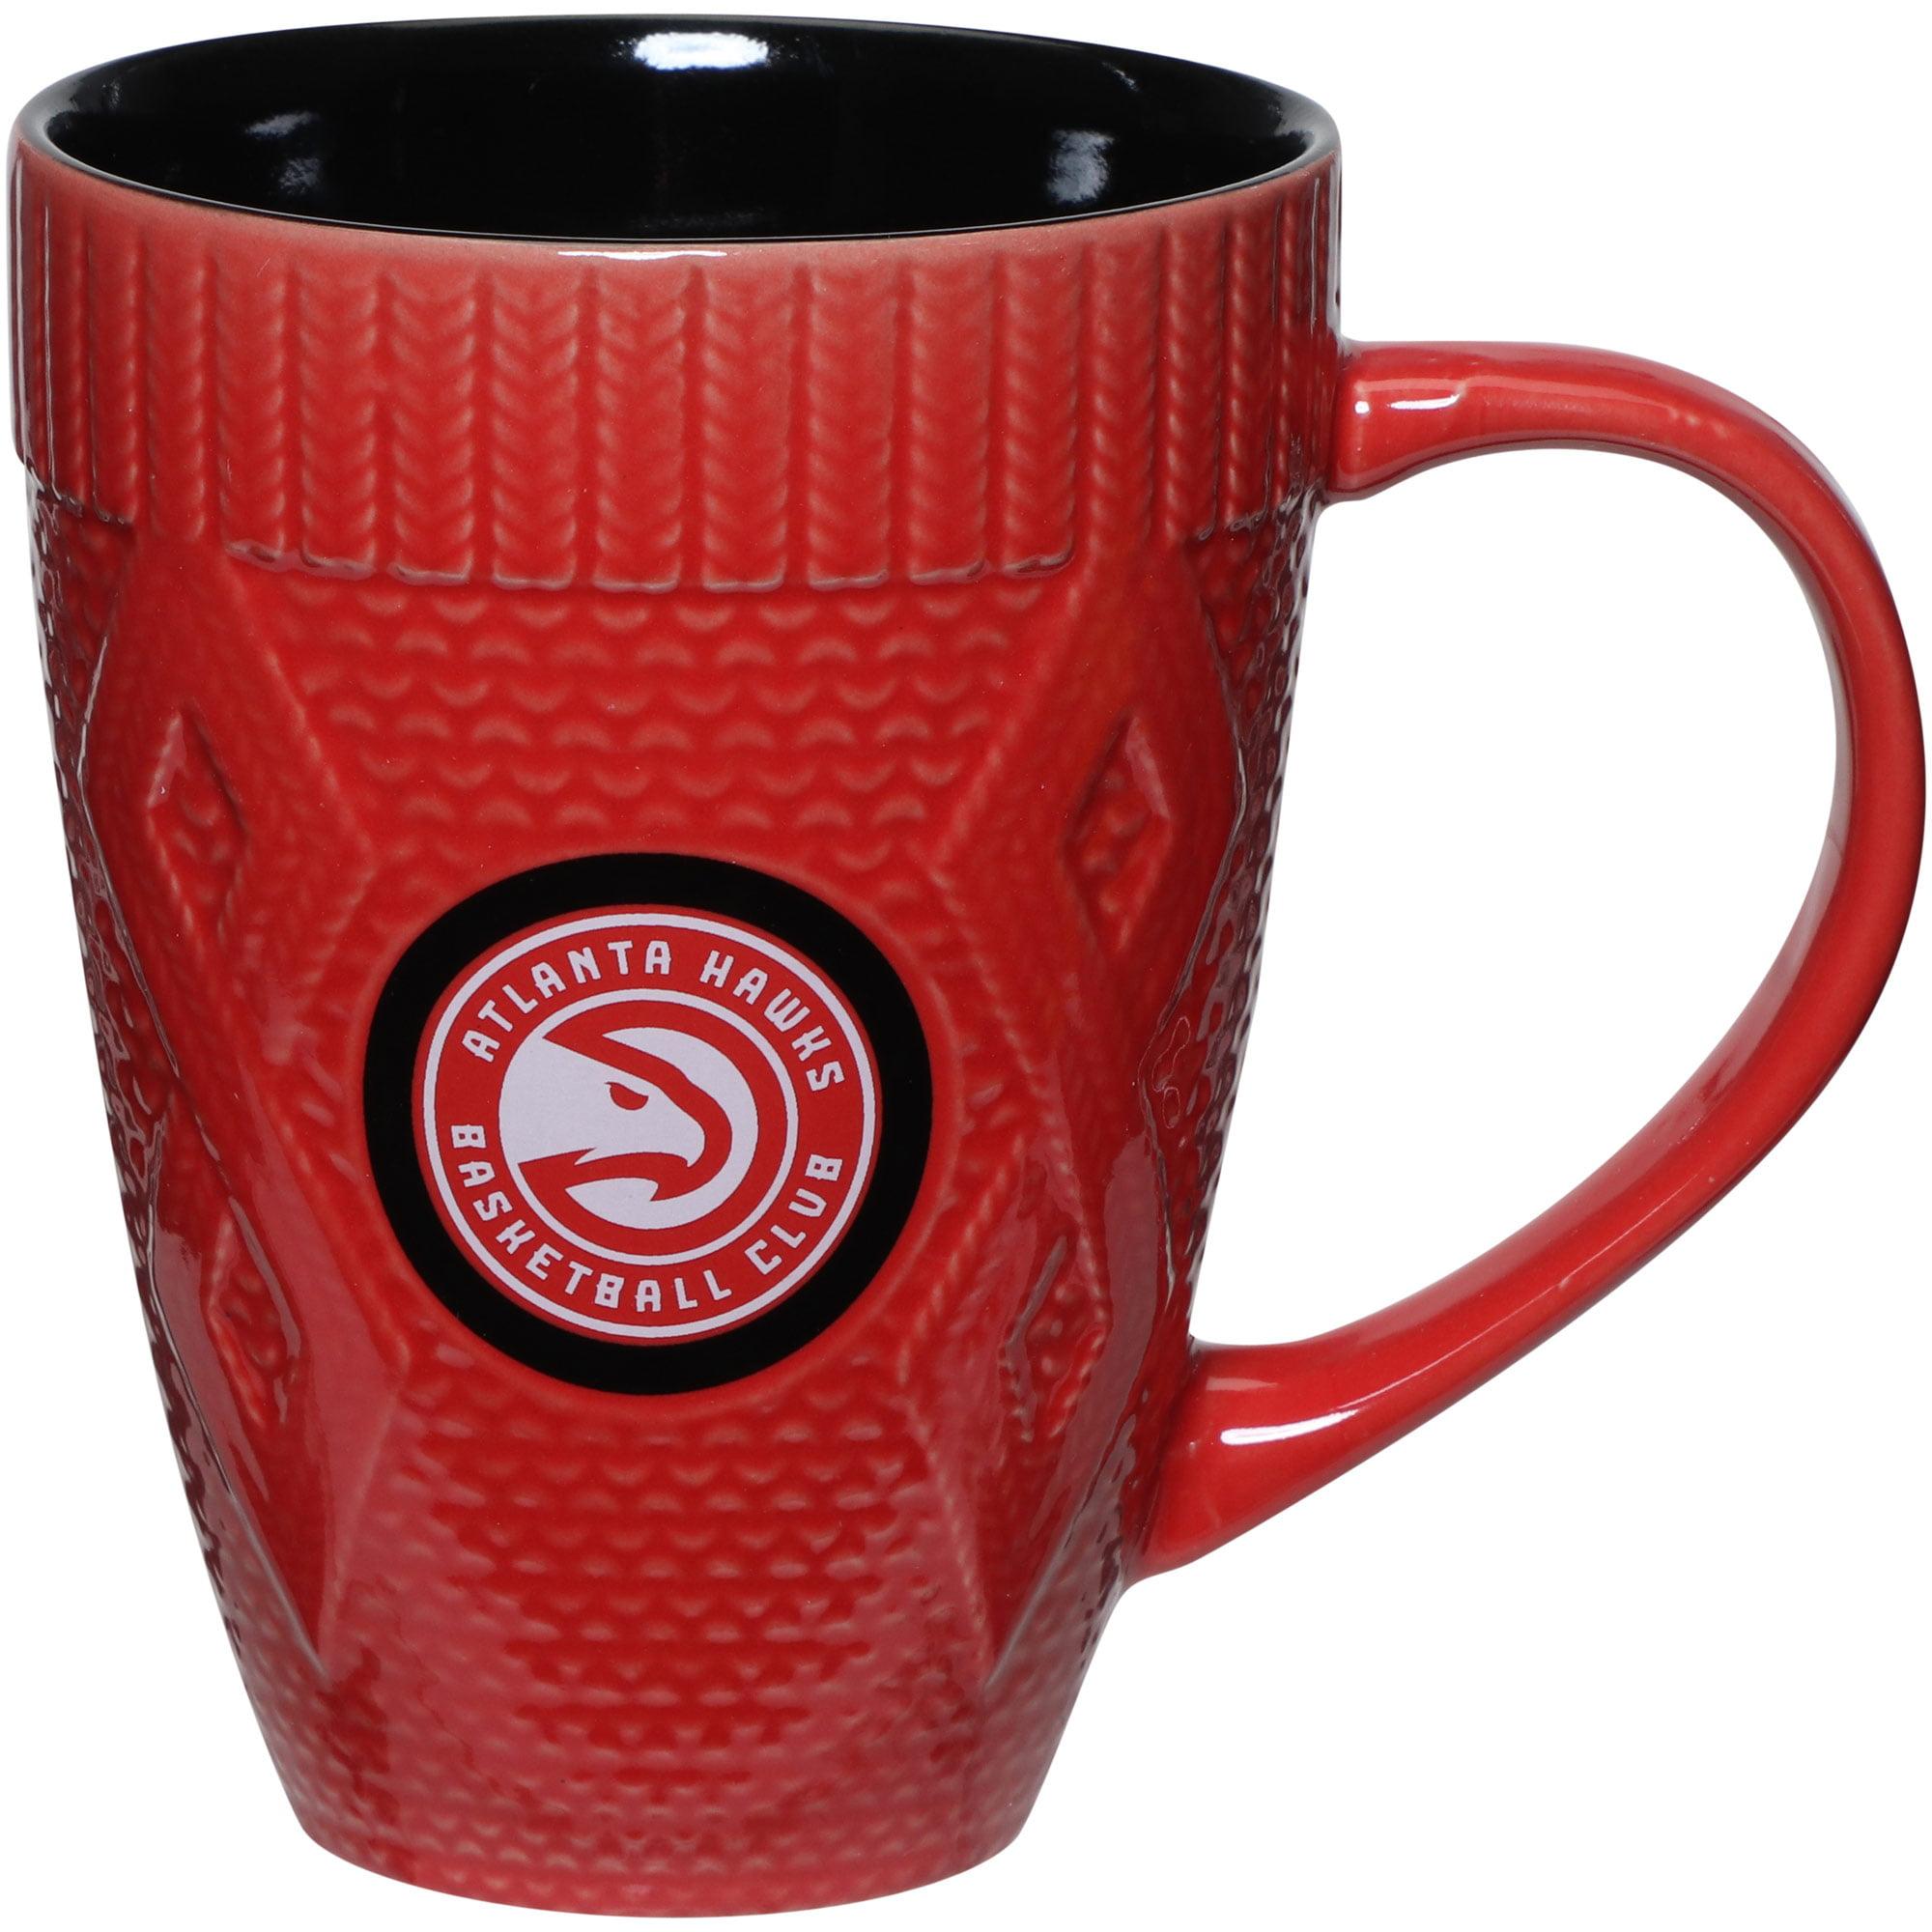 Atlanta Hawks 16oz. Sweater Mug - No Size